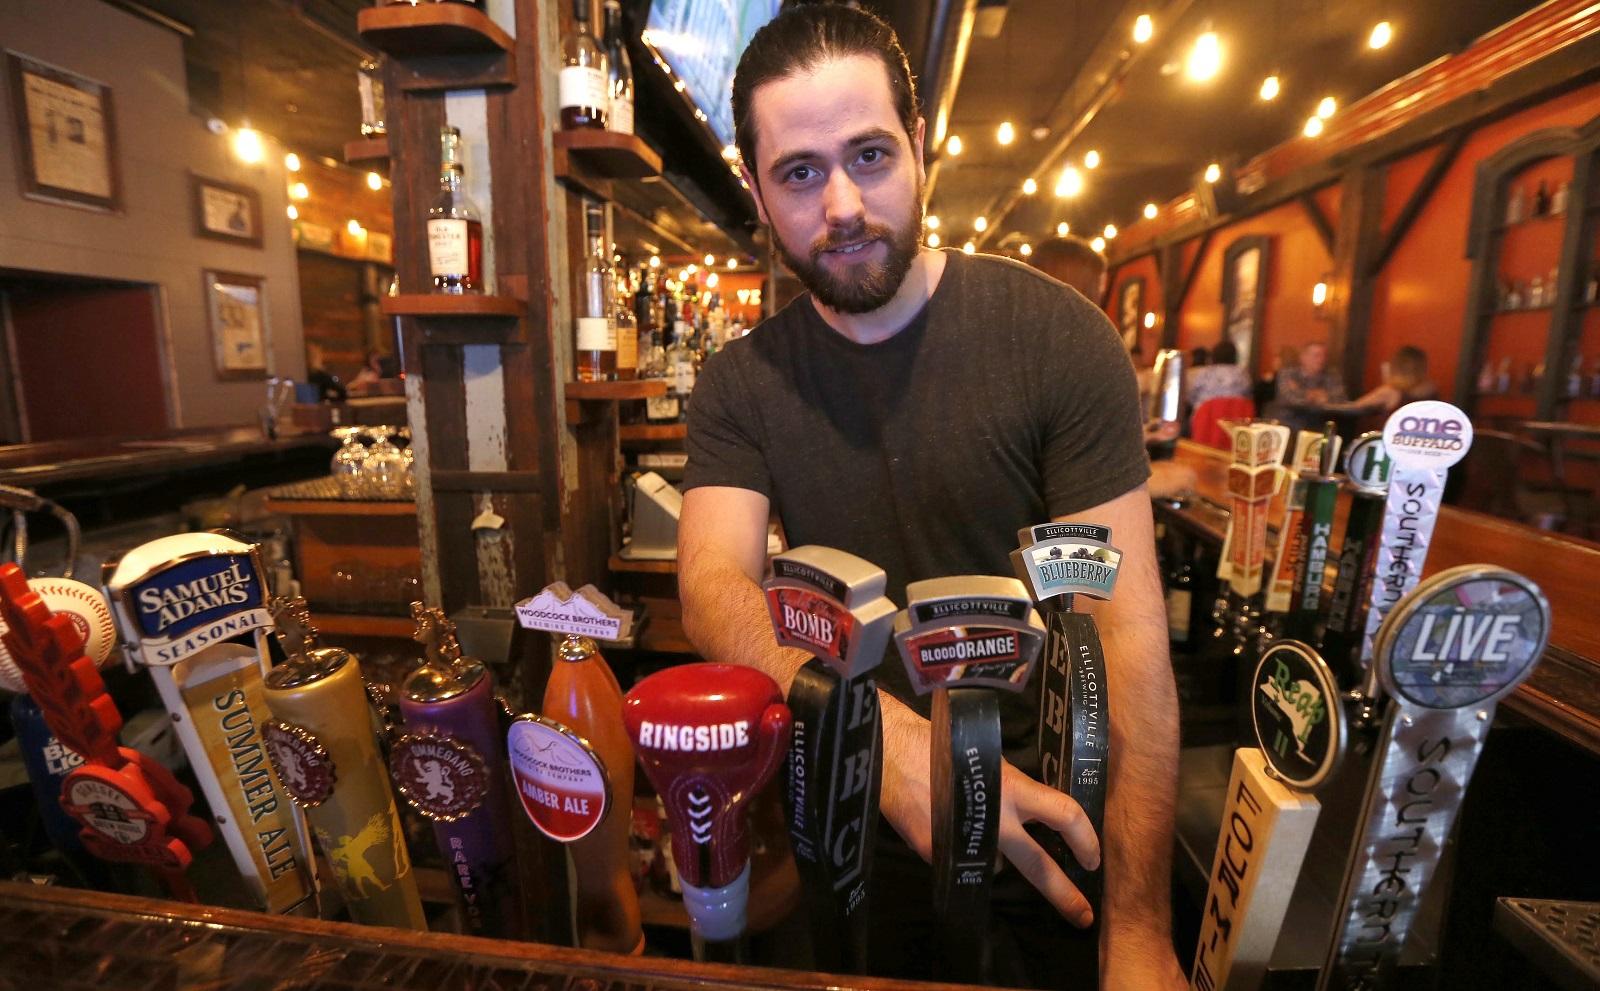 Manager and bartender Matt Santarsiero works one end at Local Kitchen & Beer Bar. (Robert Kirkham/Buffalo News)